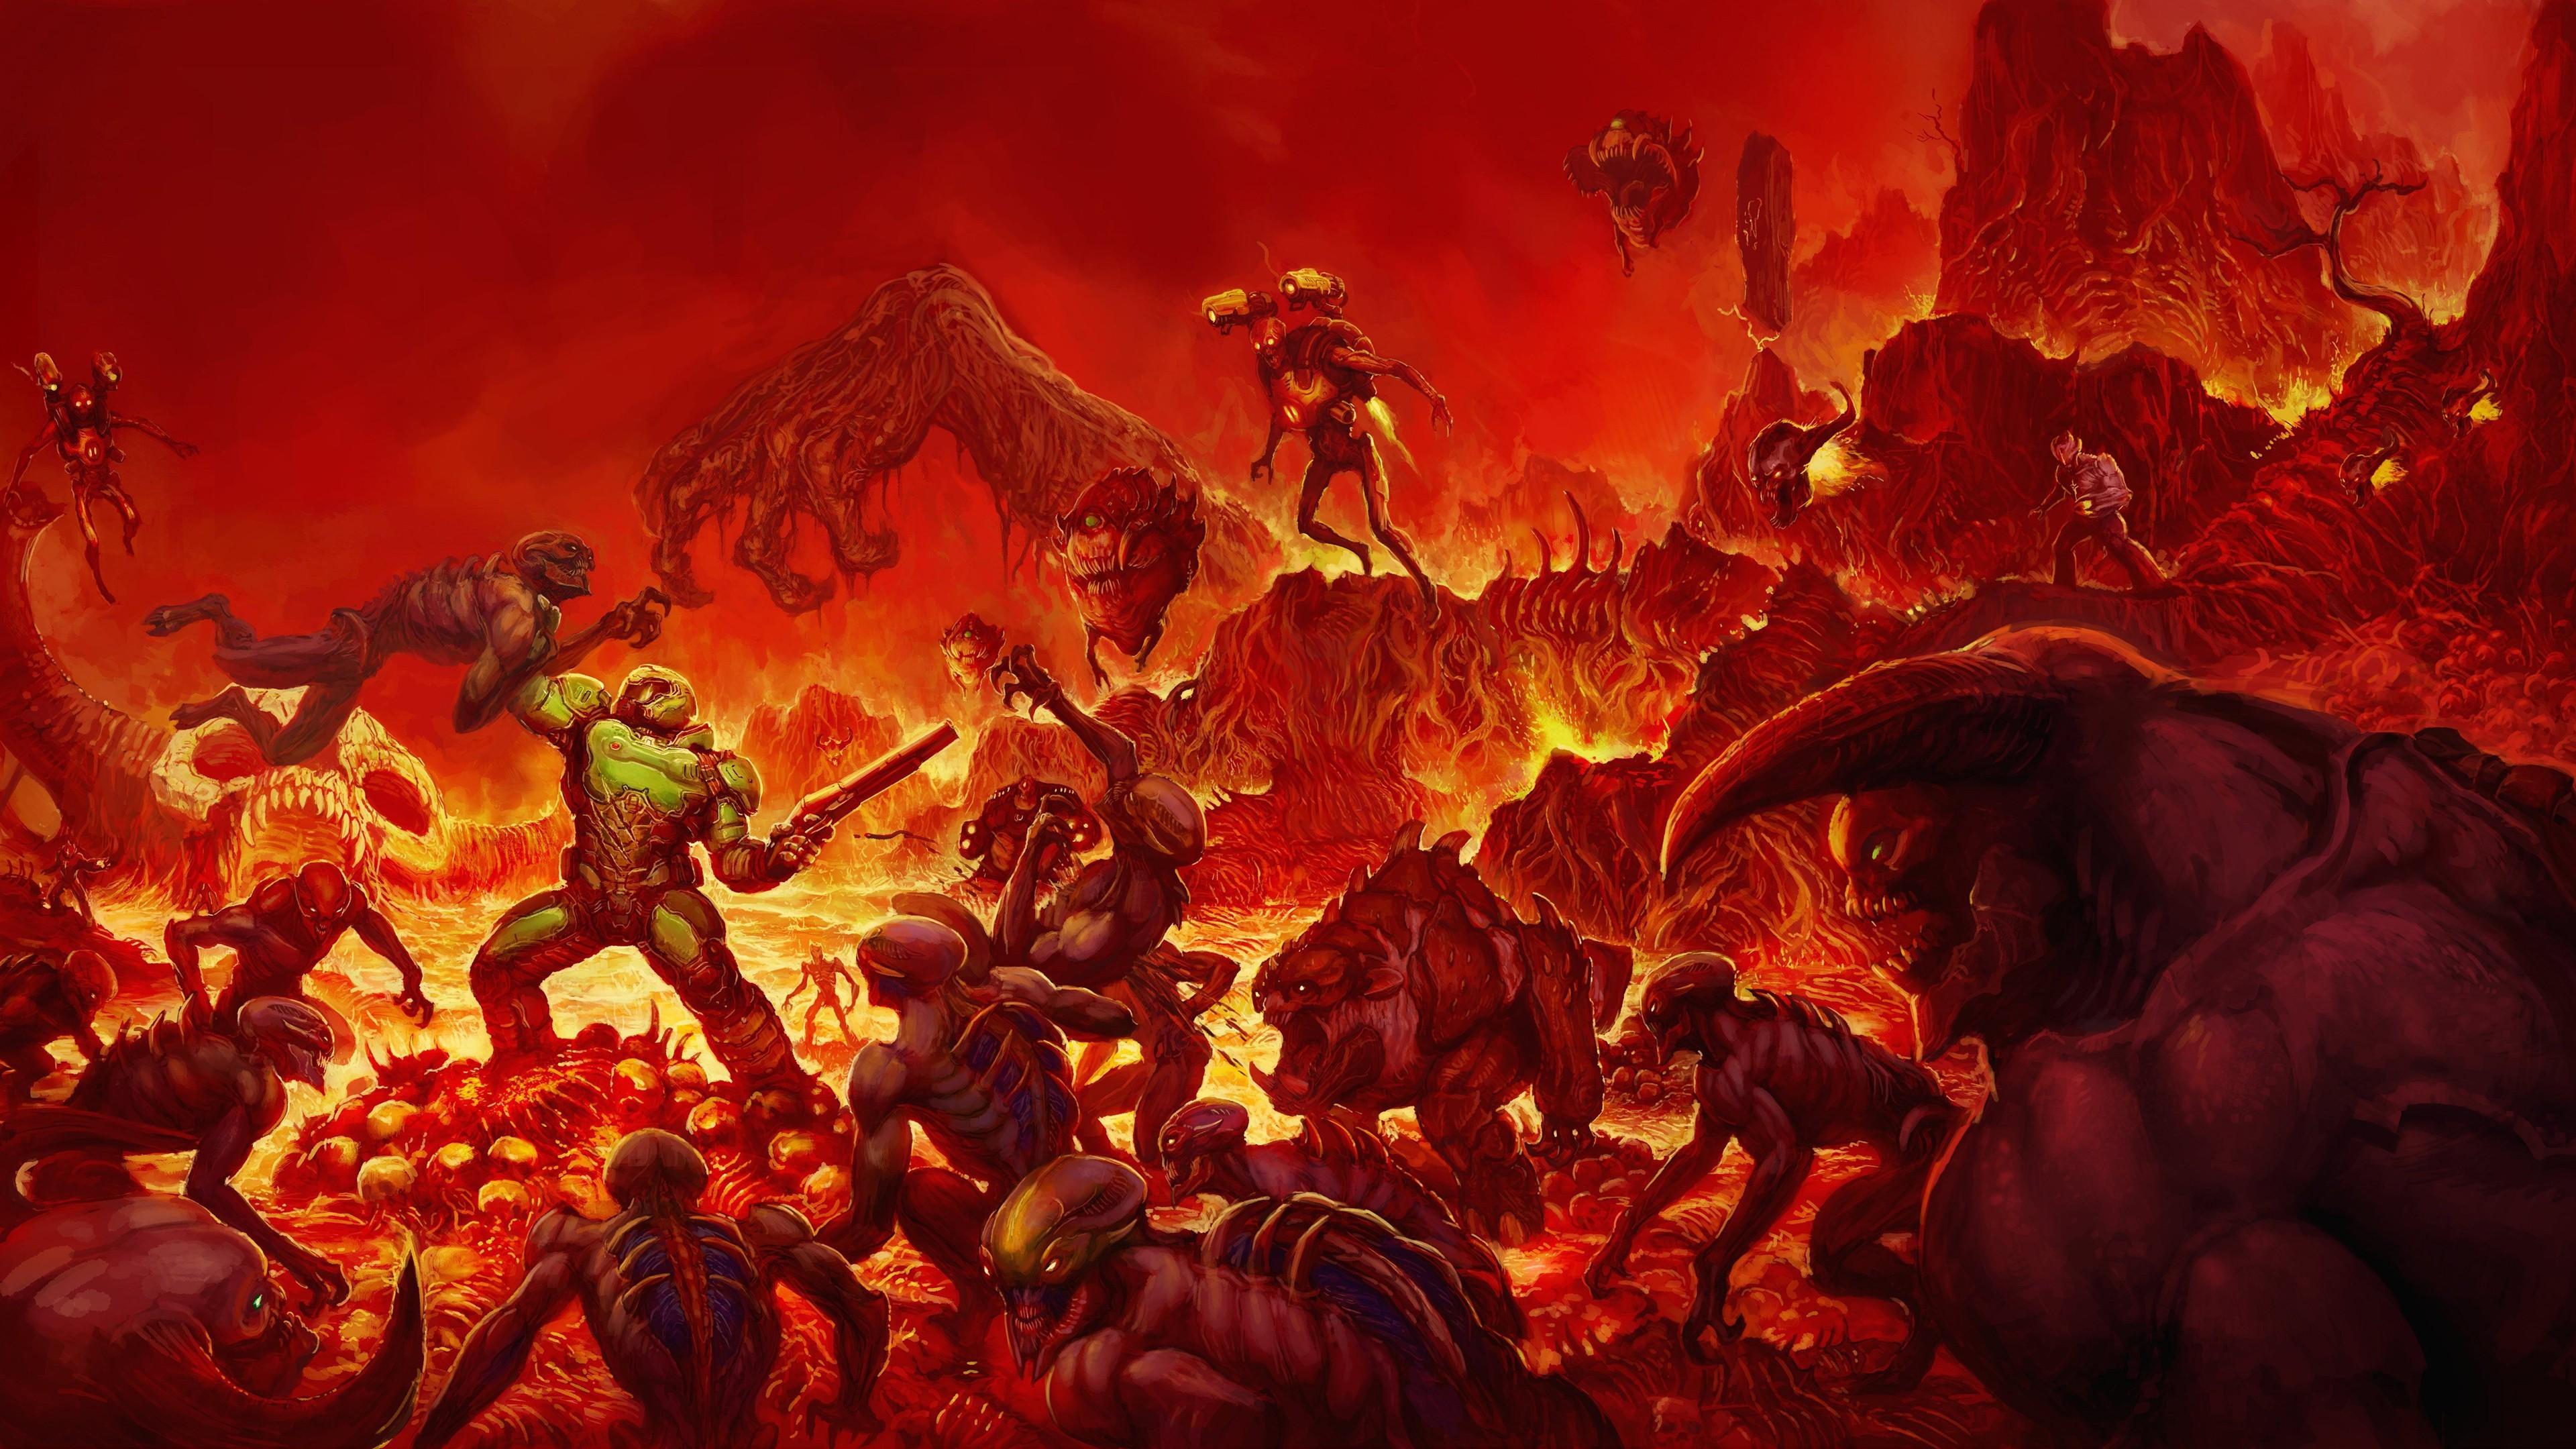 Wallpaper : 3840x2160 px, Bethesda Softworks, demon, Doom